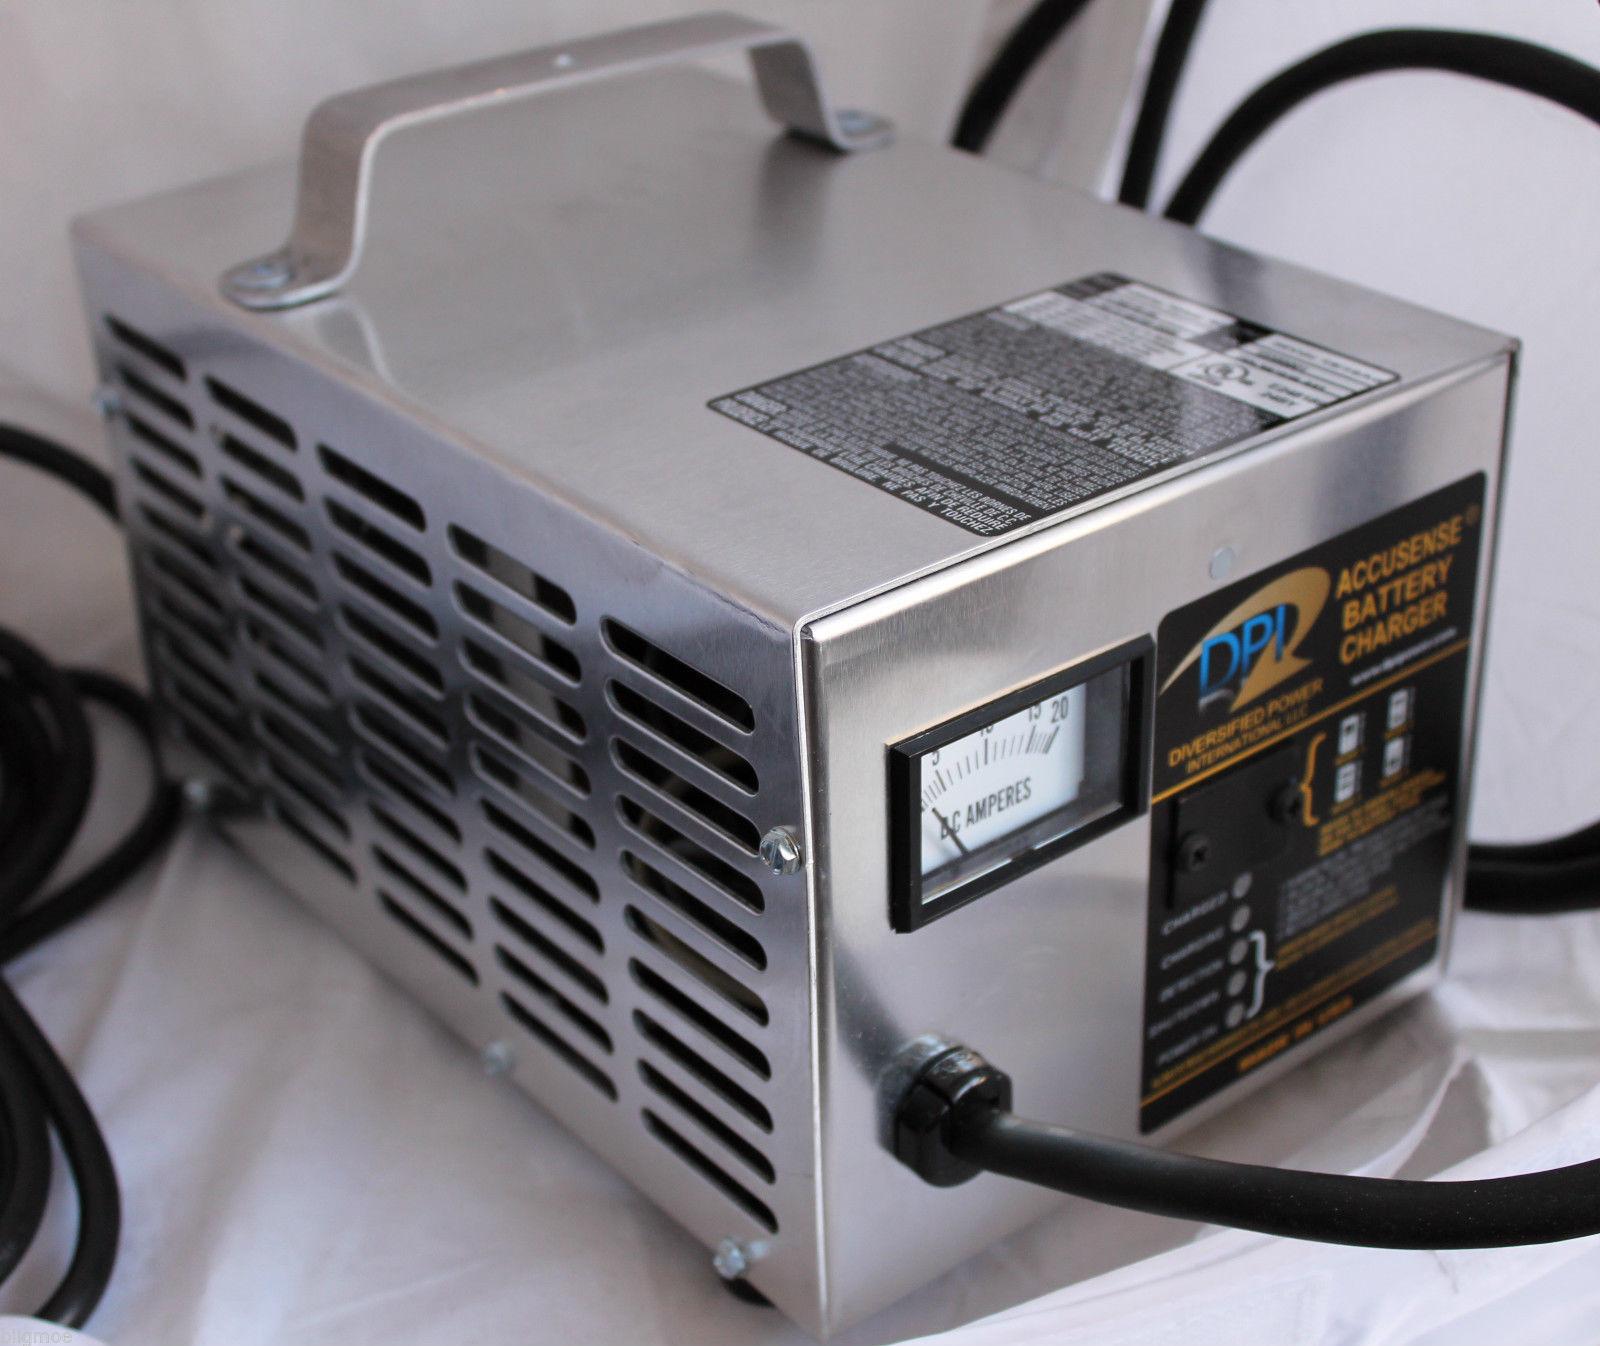 220V-240V DPI 48V 17A Golf Cart Battery Charger with Yamaha Nabson Connector